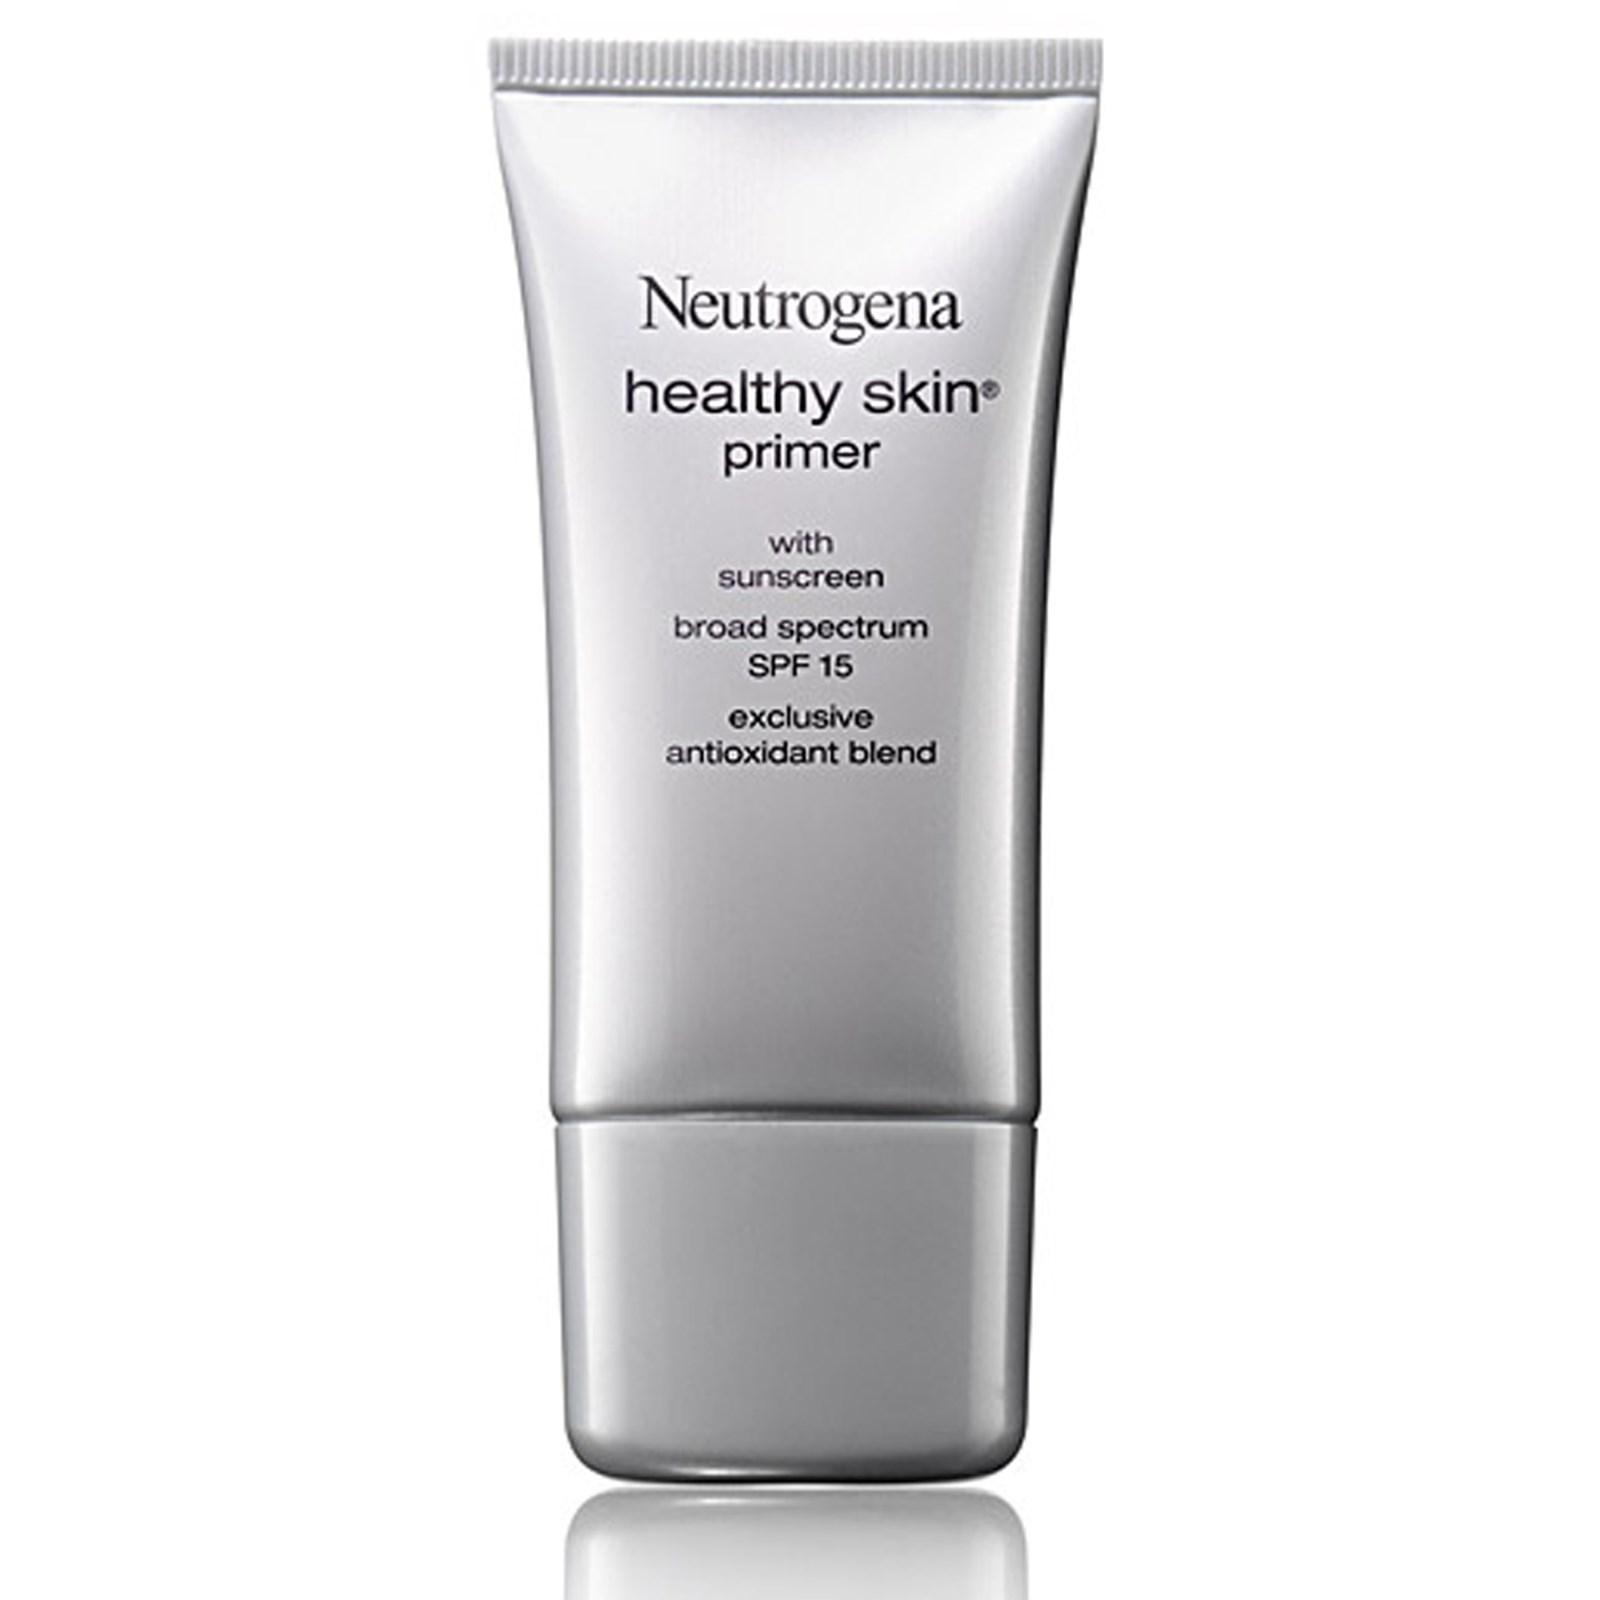 Neutrogena primer review